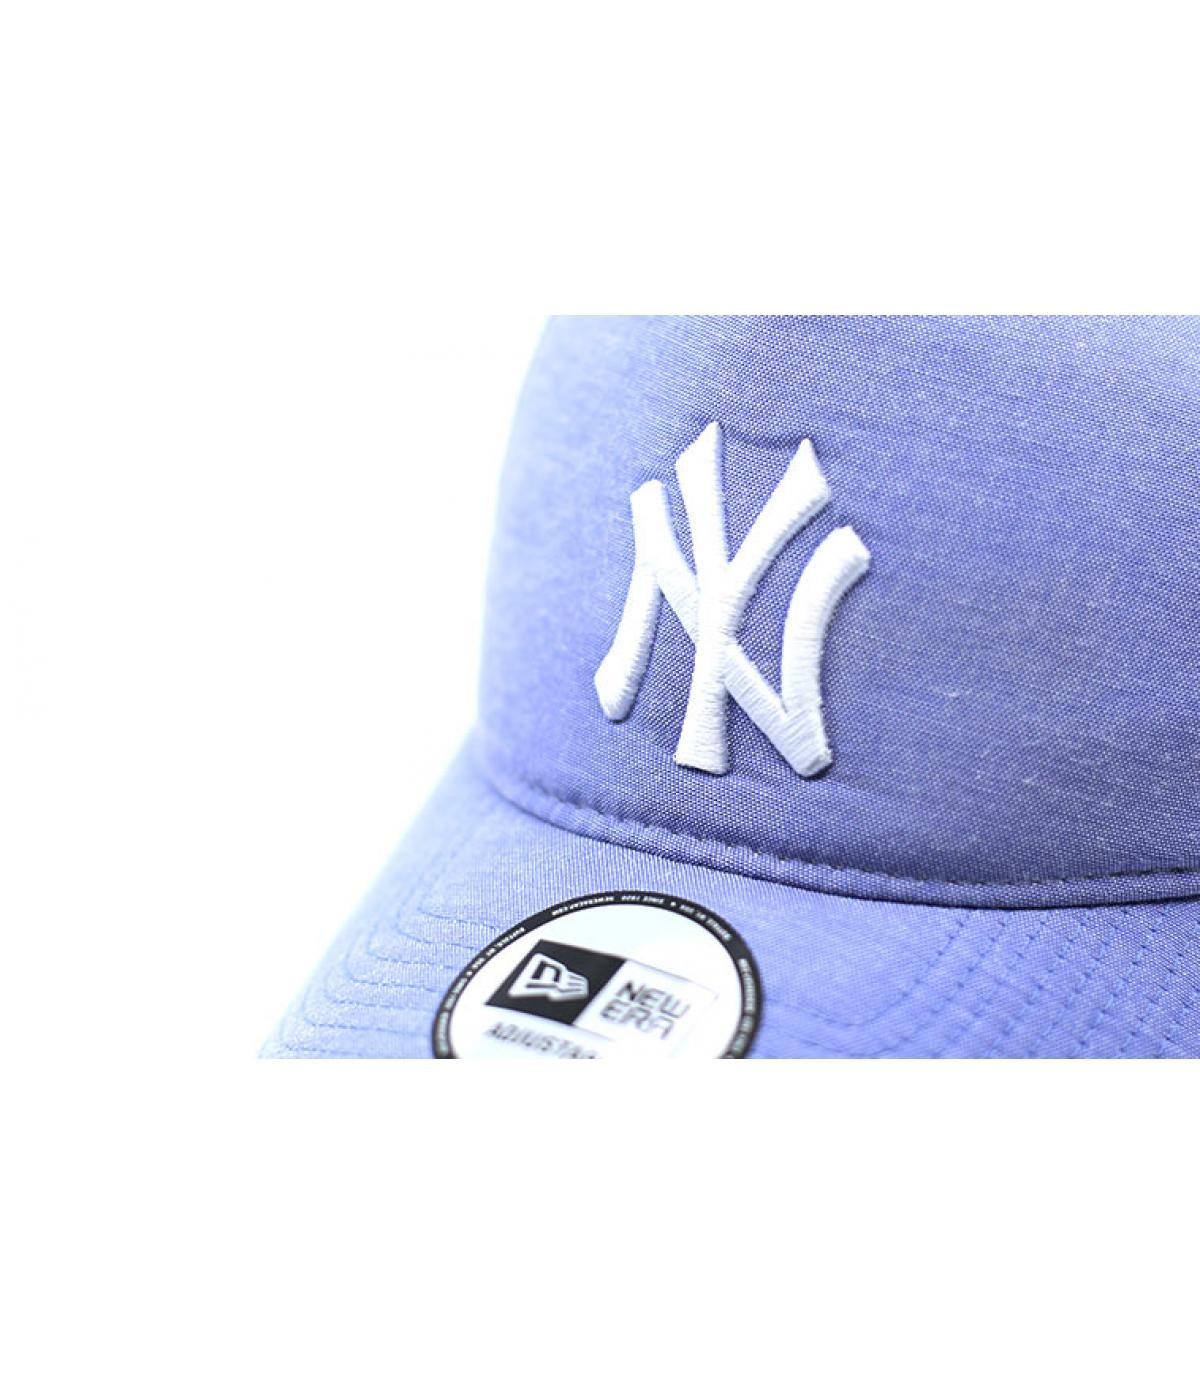 Dettagli MLB Oxford NY sky blue - image 3